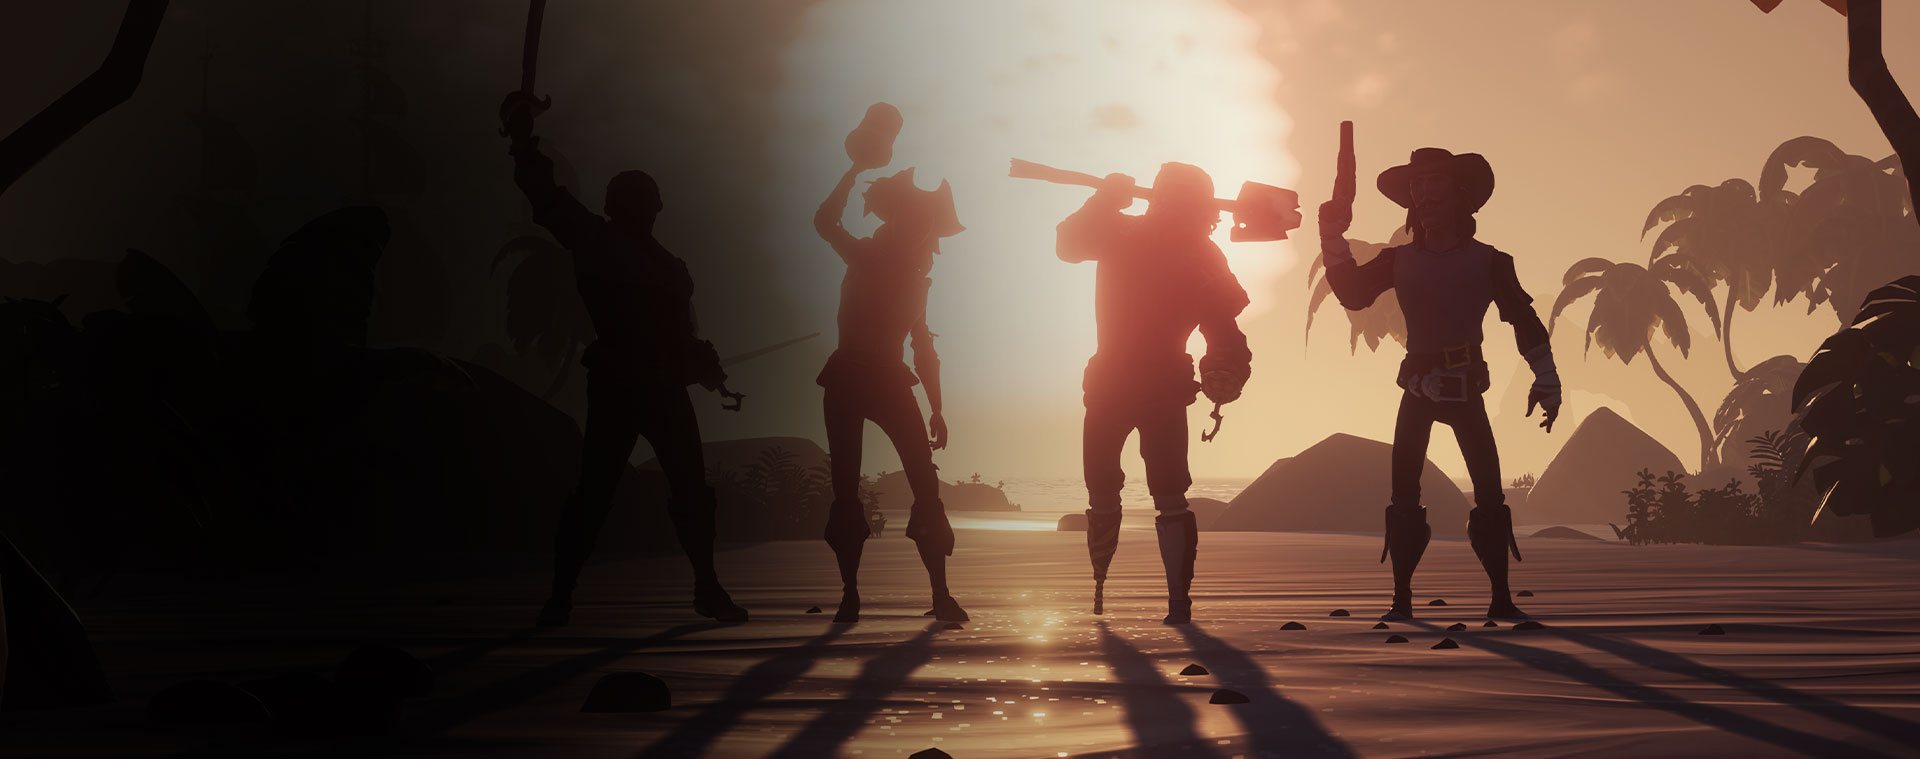 Sea of Thieves 中的四個角色在日落前擺姿勢